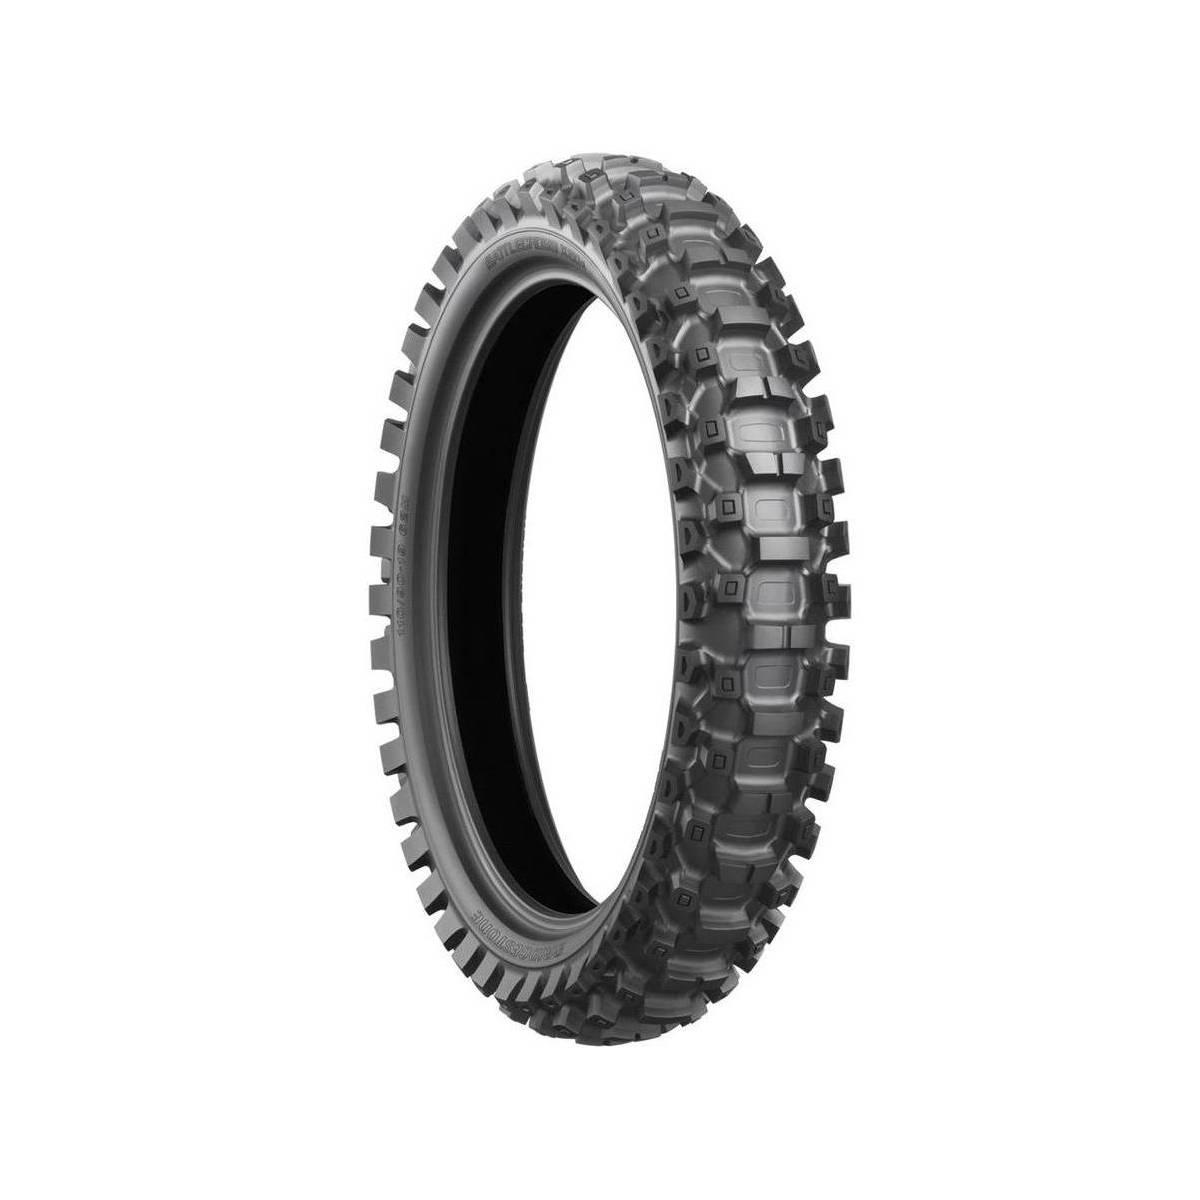 B9010016 - Neumatico Bridgestone 90 100-16